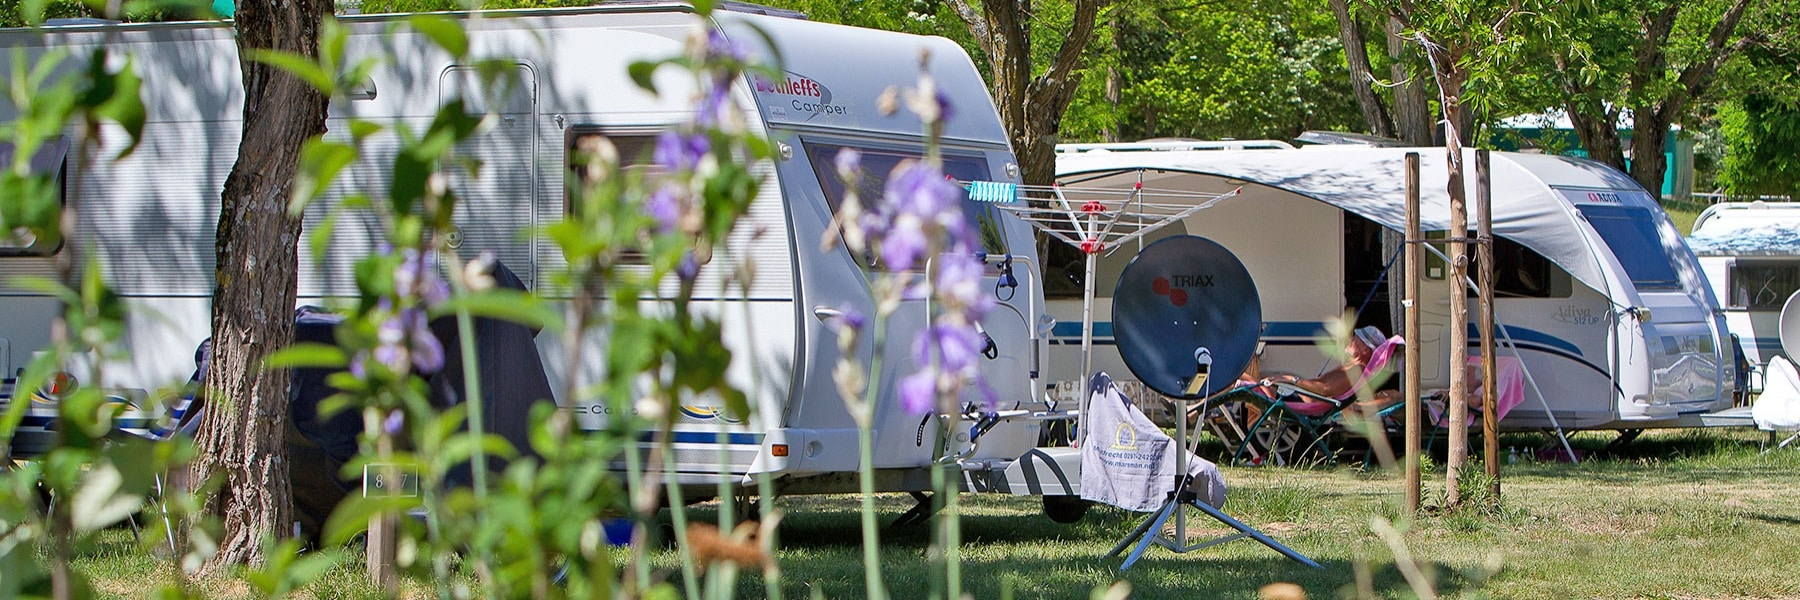 Accueil de clubs de caravanes et de camping-cars